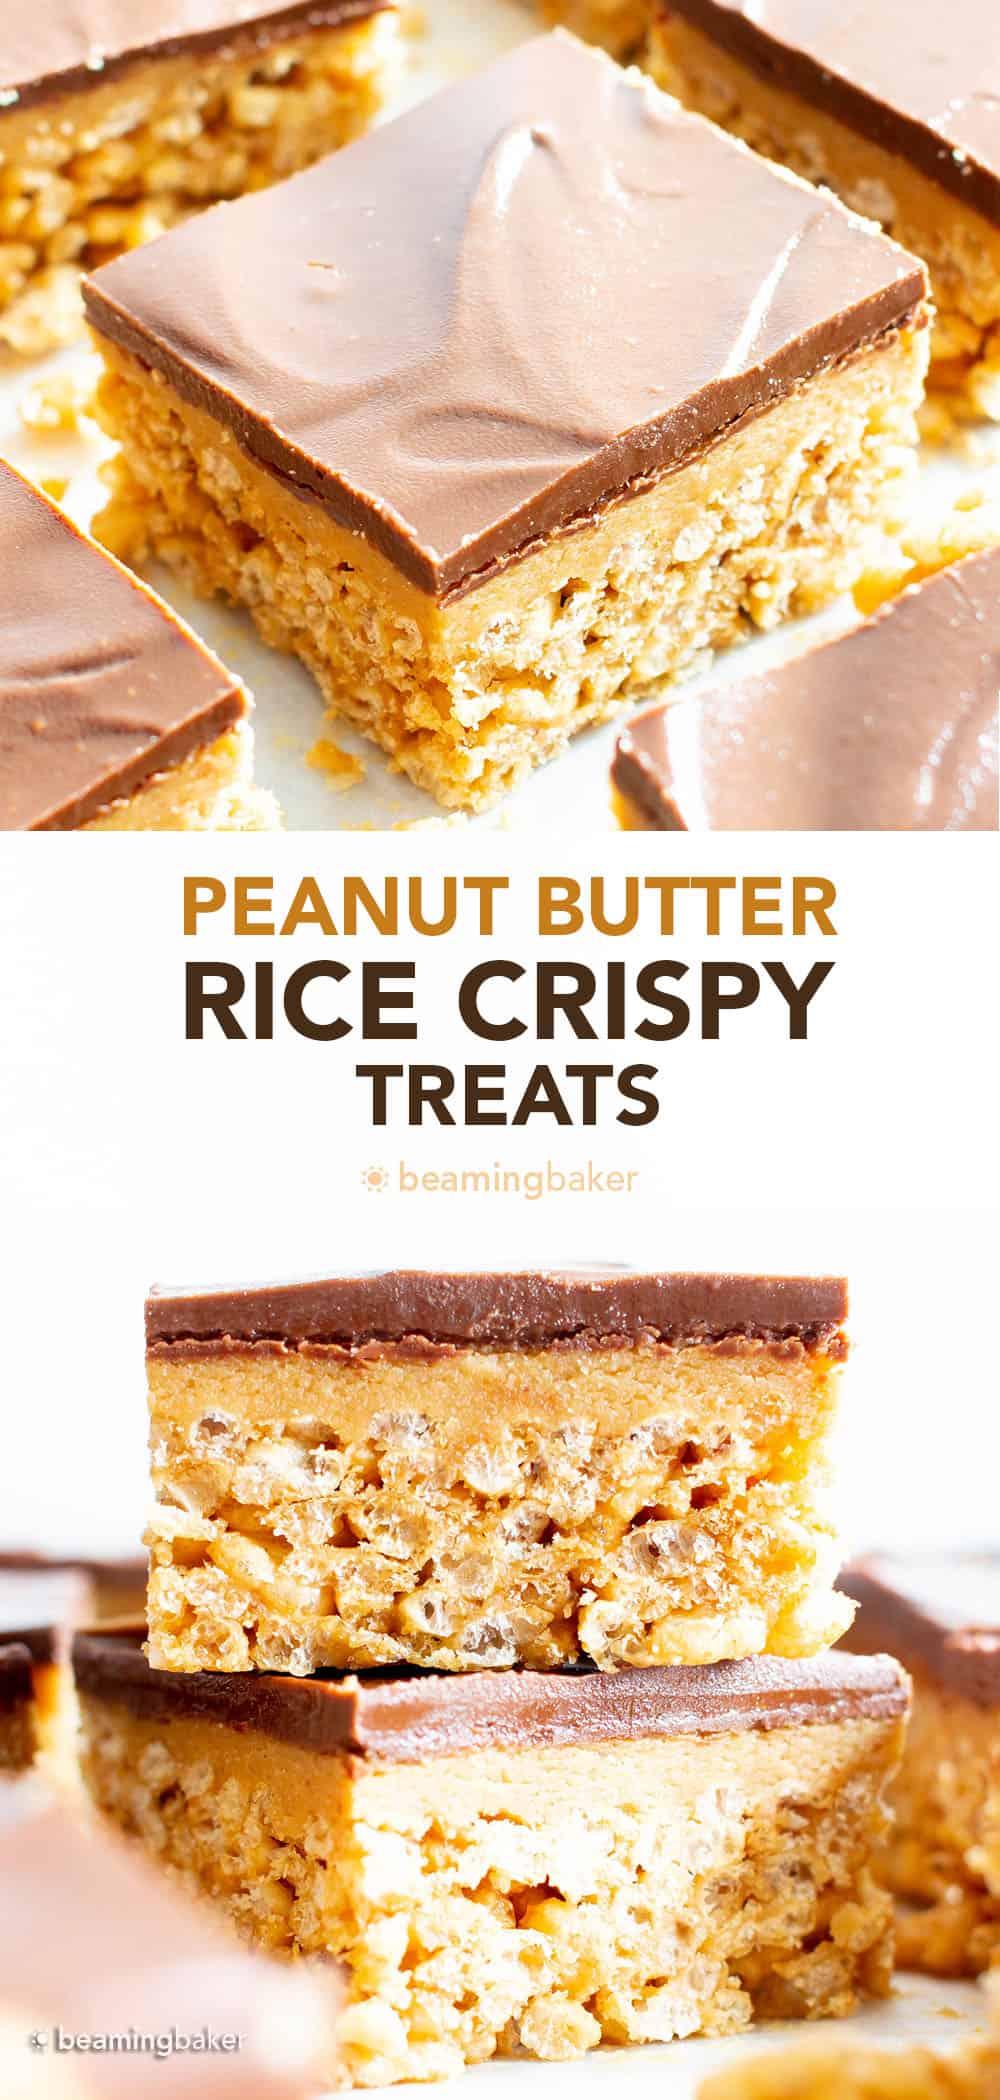 No Bake Peanut Butter Rice Crispy Treats pin image